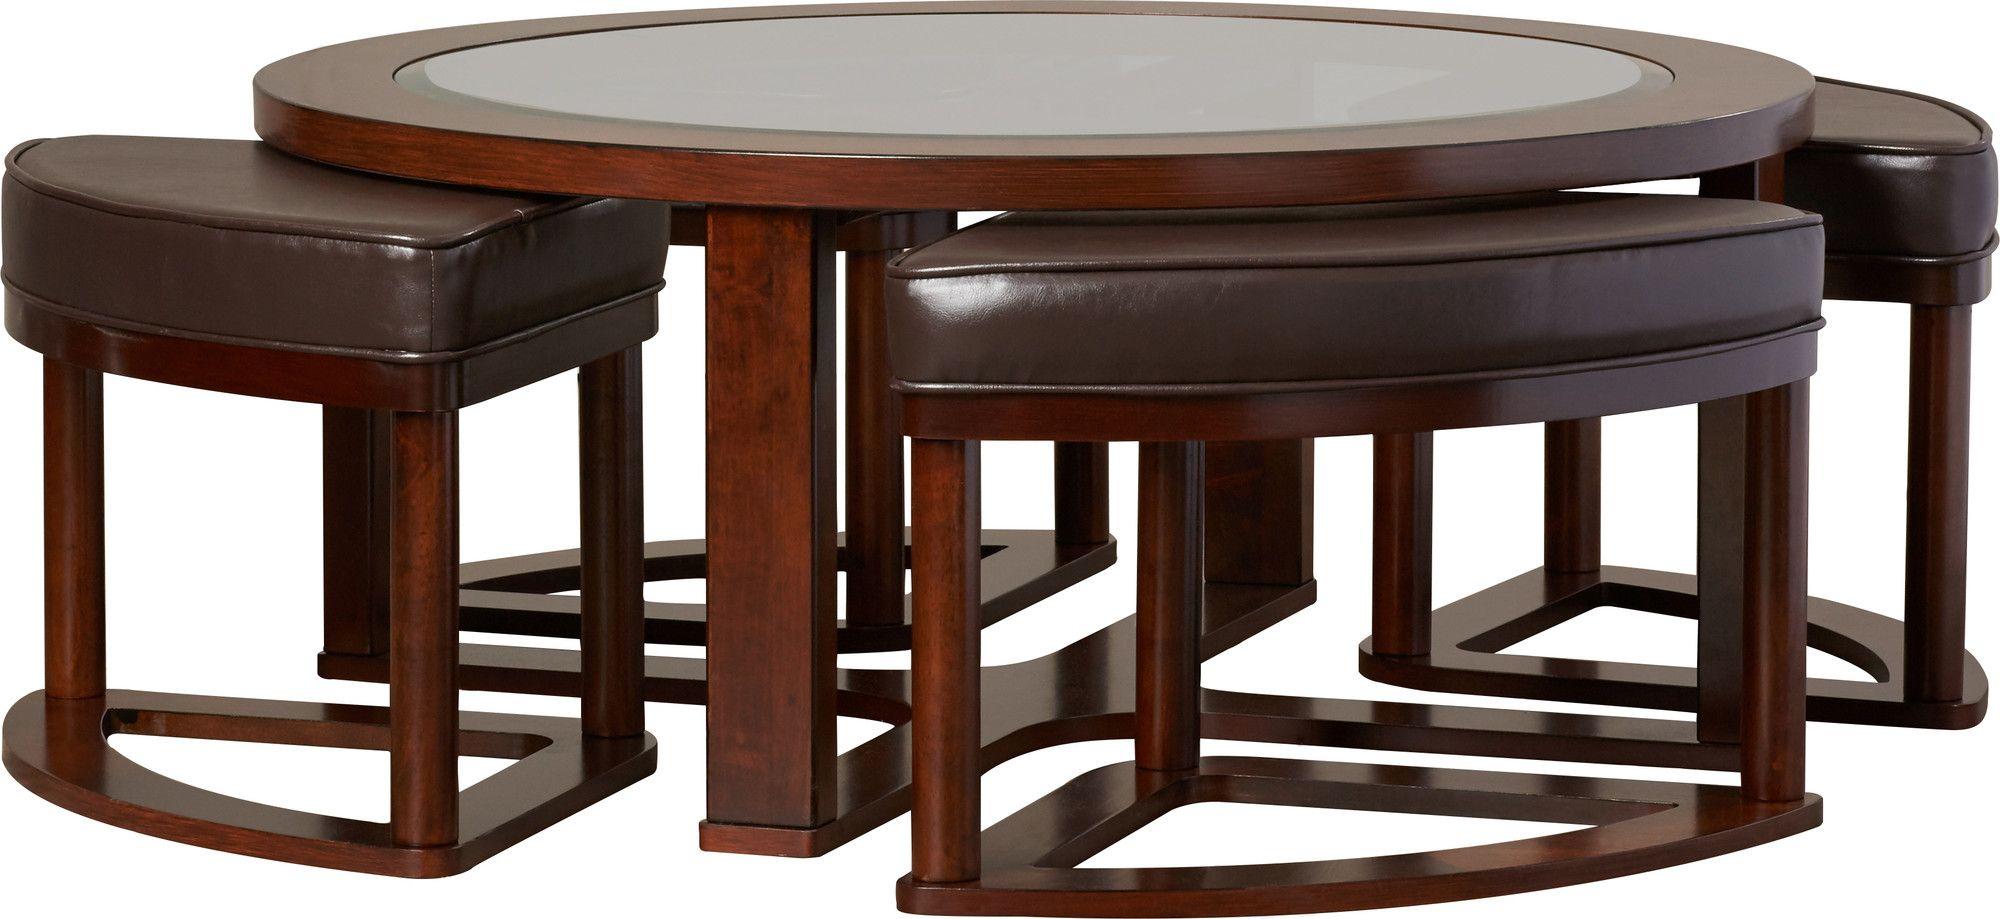 Eastin coffee table with nested stools hogar